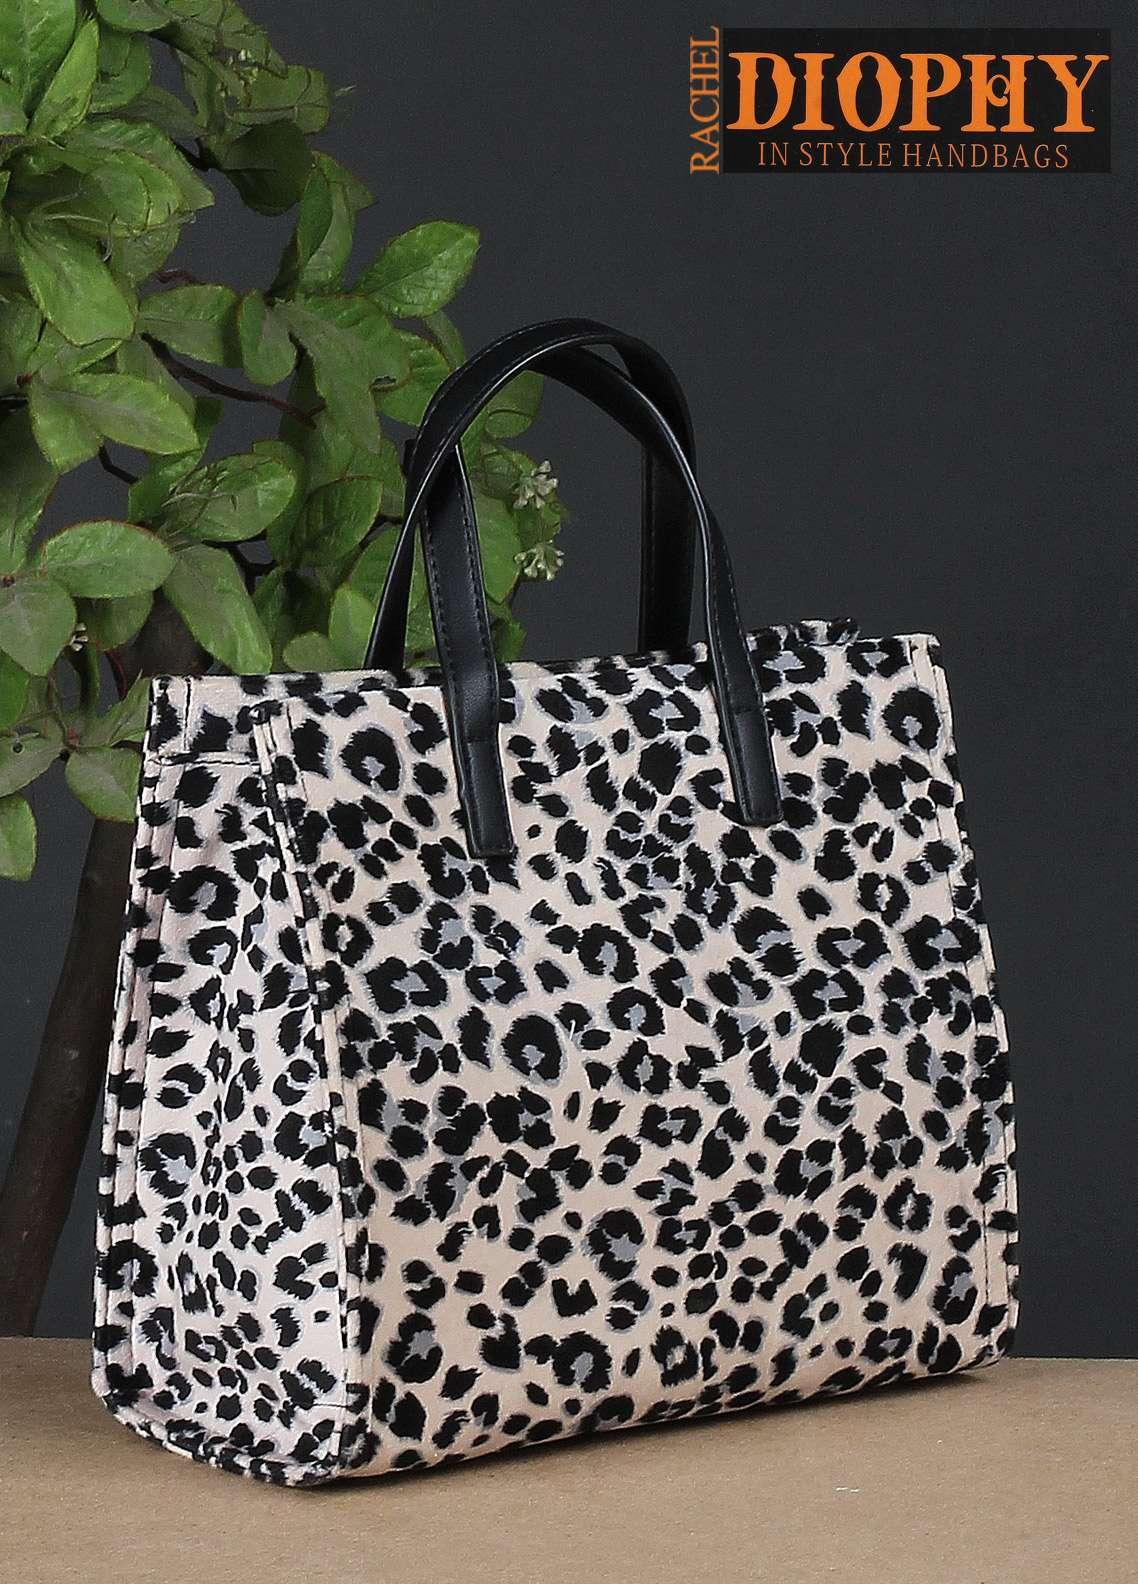 Rachel Diophy PU Leather Satchels Handbags for Women - Black with Velvet Textured